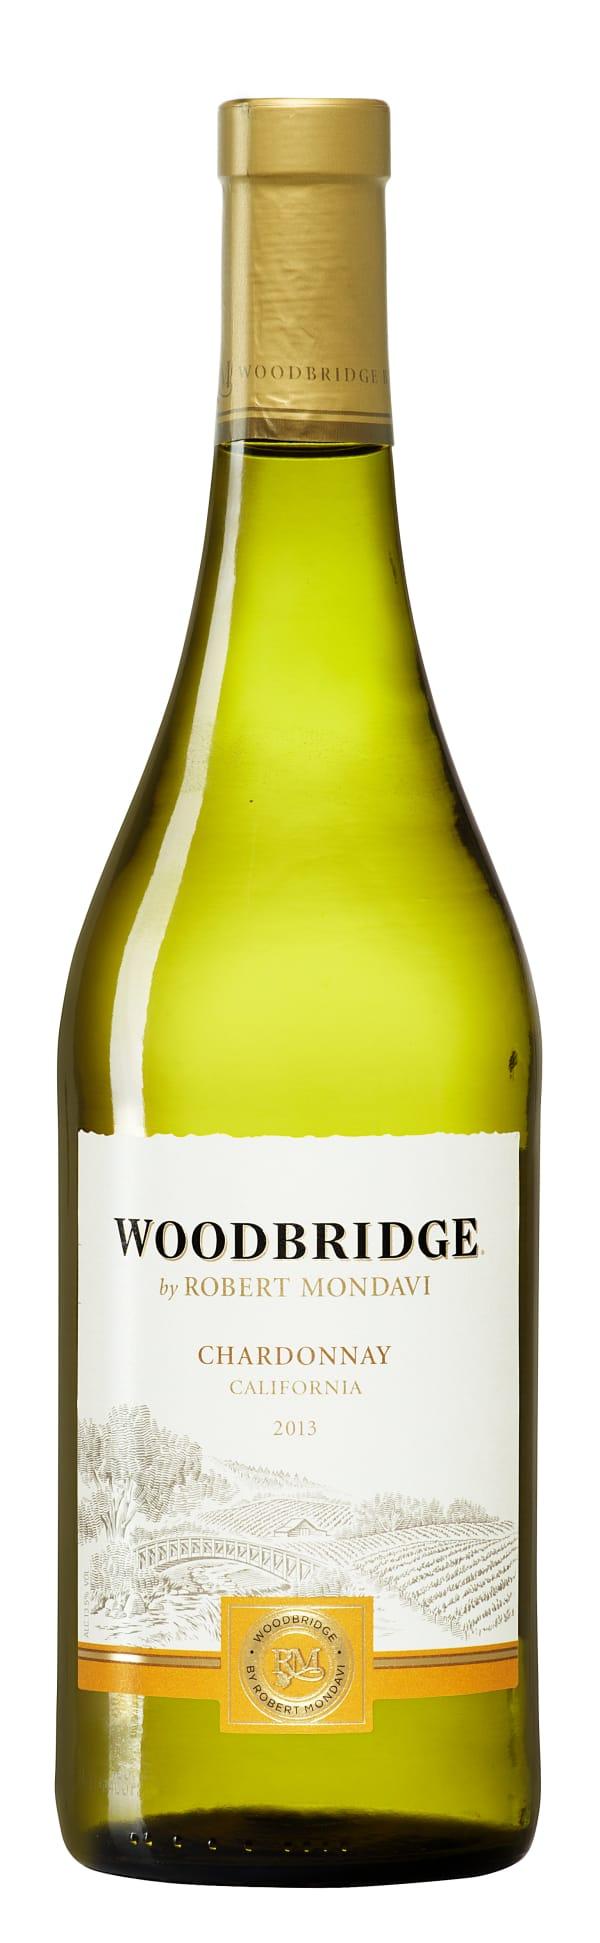 Robert Mondavi Woodbridge Chardonnay 2016